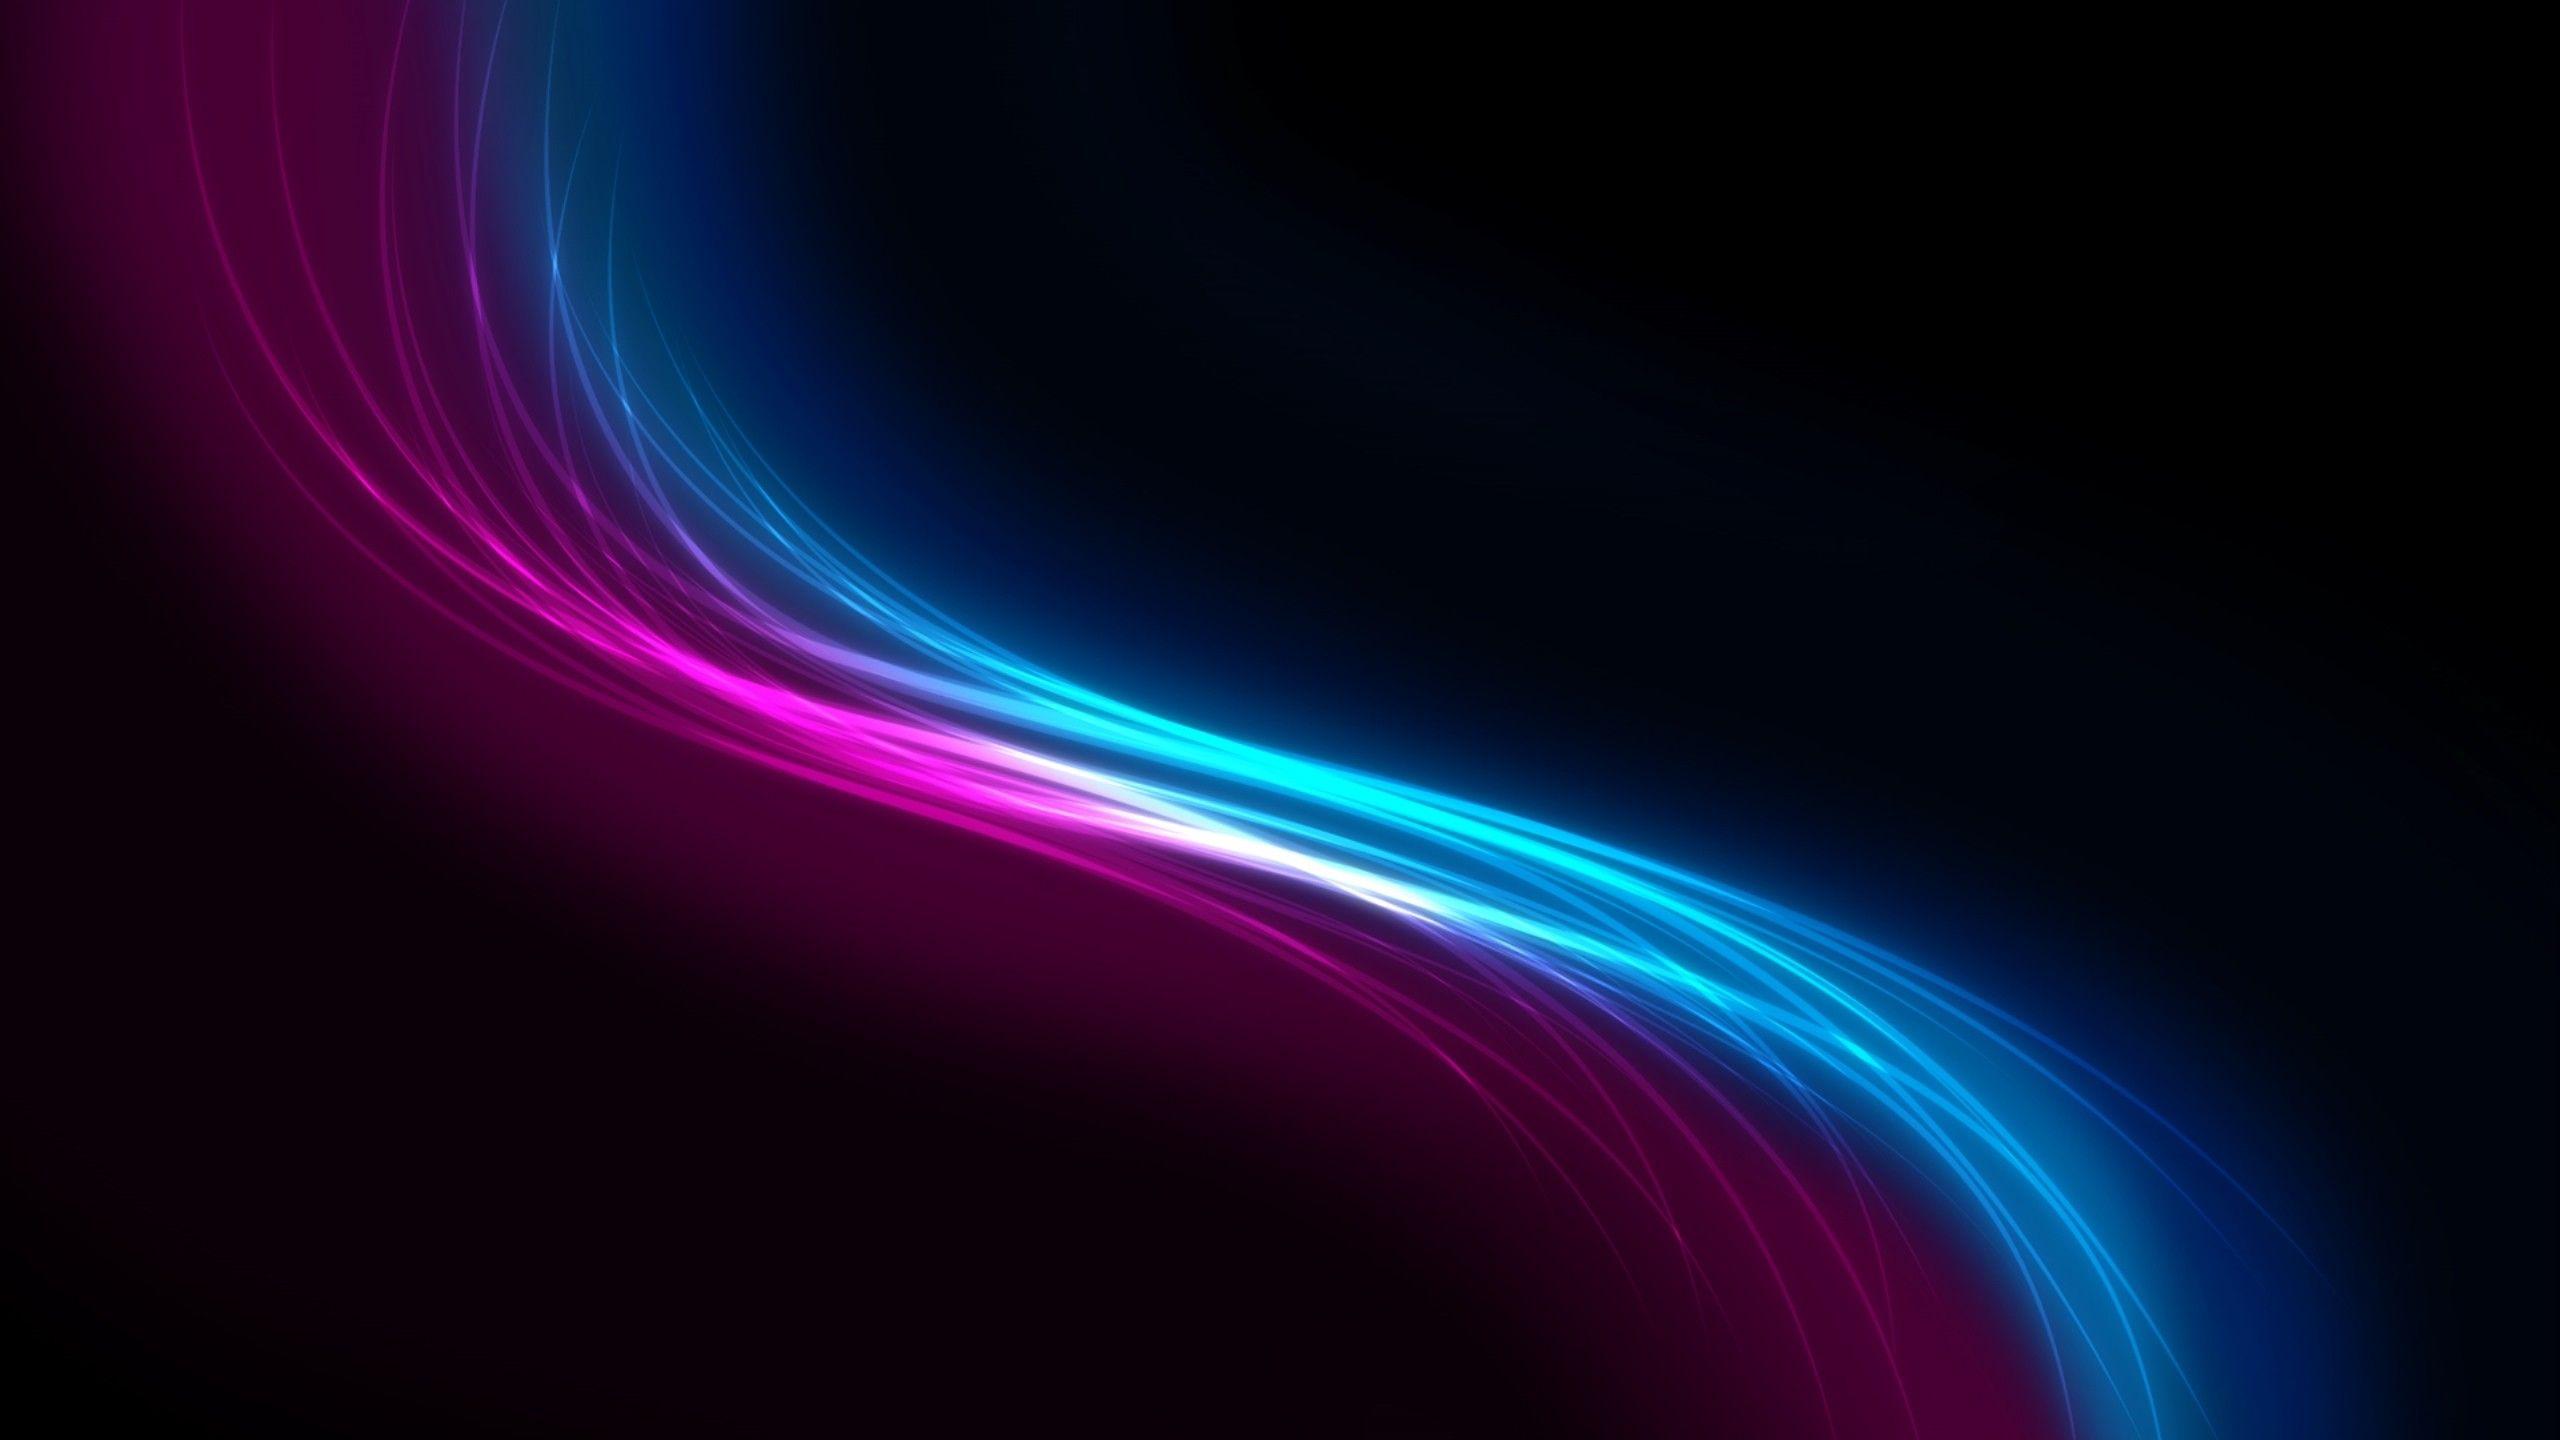 Siluet Black Pink And Blue Light Abstract Hd Wallpapers в